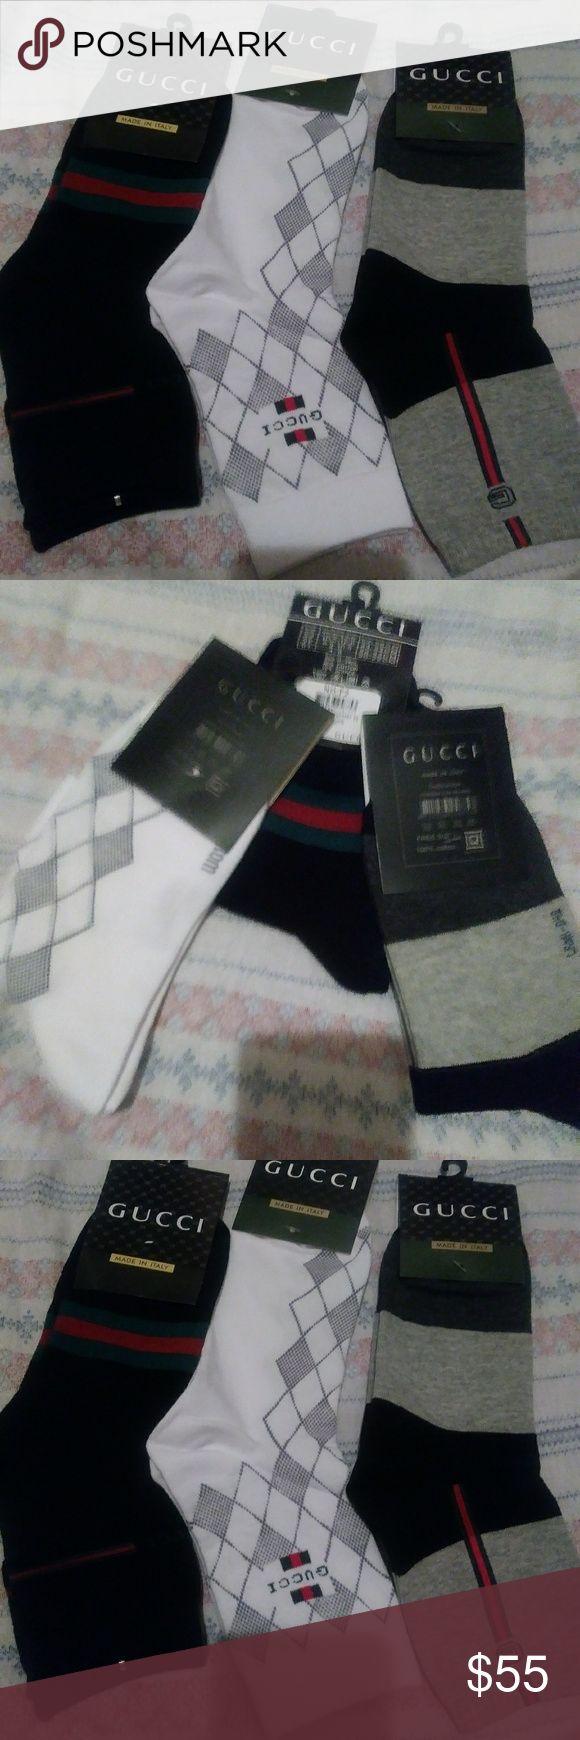 3pairs GUCCI 100%cotton socks unisex 3pairs New in package Gucci. Cotton socks unisex Gucci Accessories Hosiery & Socks